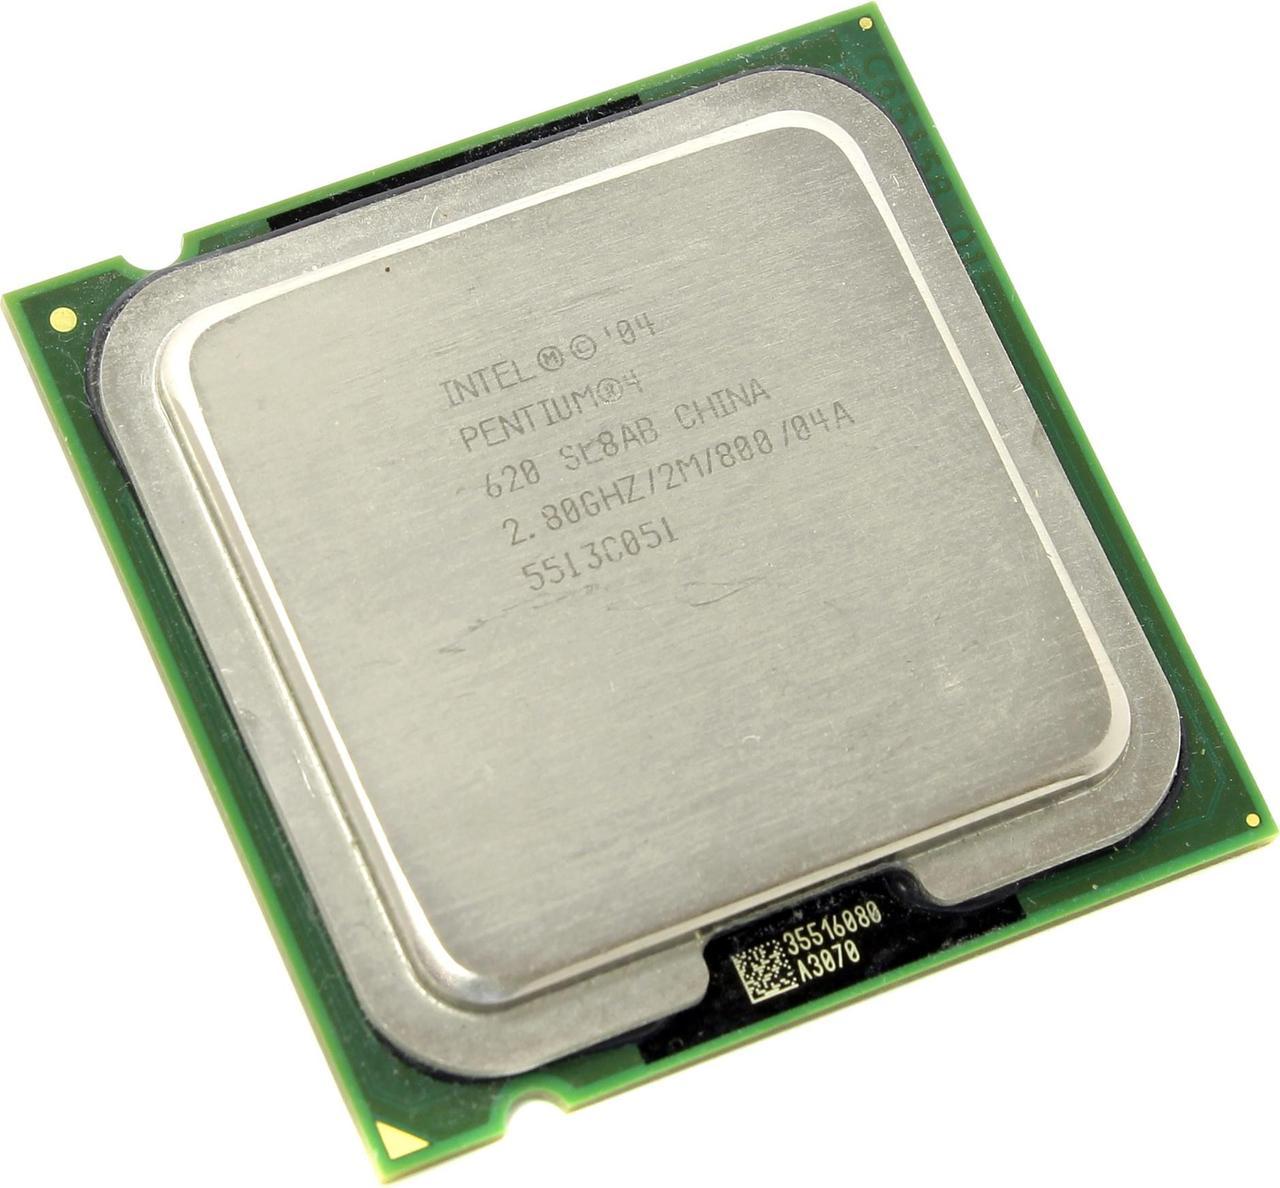 Процессор Intel Pentium 4 620 2.80GHz/2M/800 (SL8AB) s775, tray